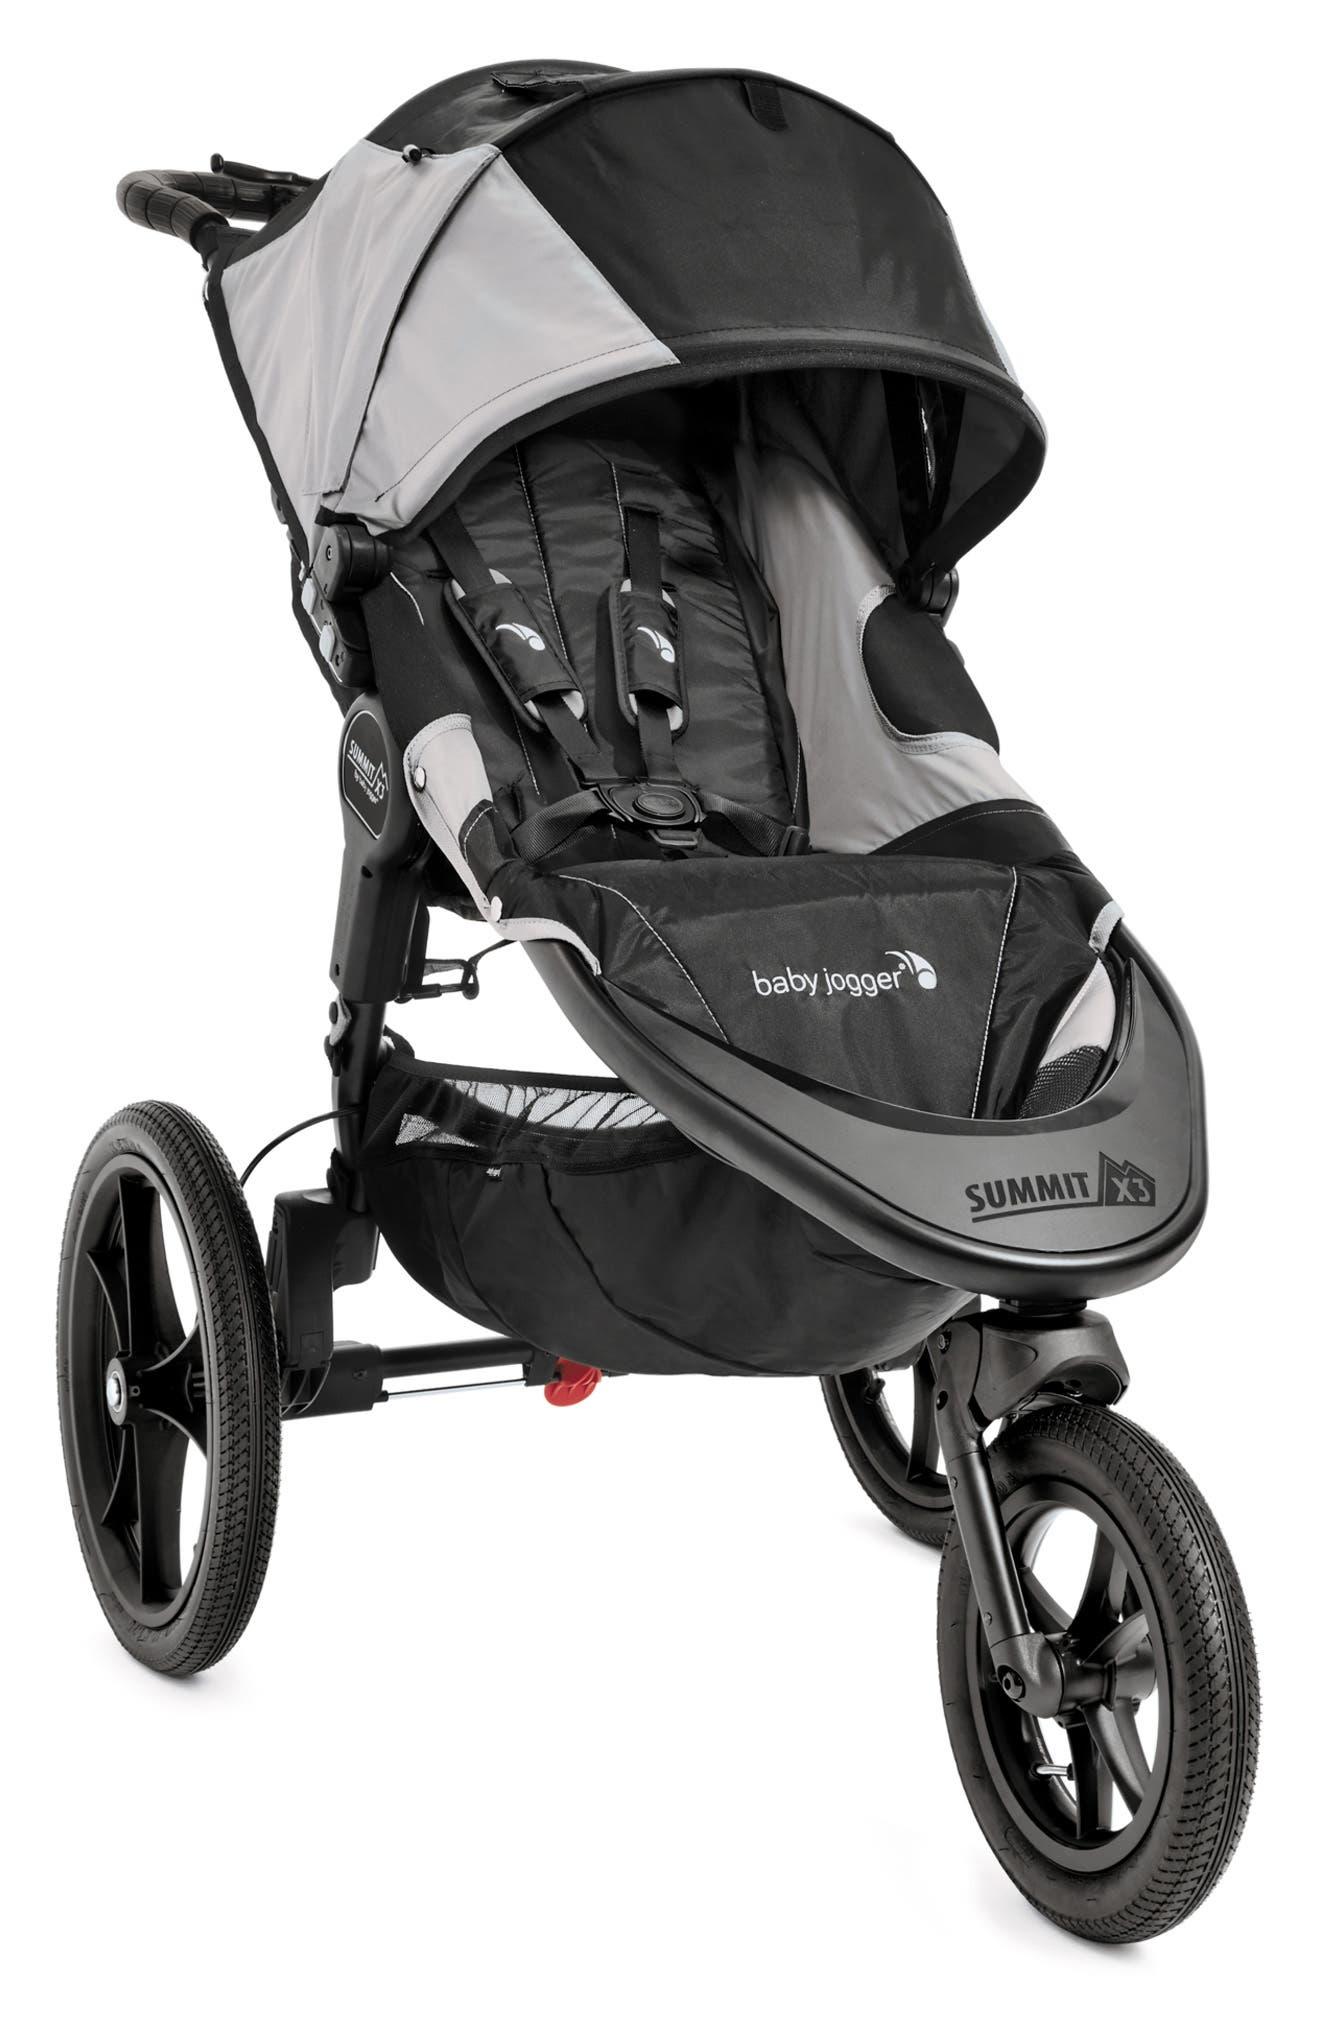 Baby Jogger Summit X3 Single Jogging Stroller & Weather Shield